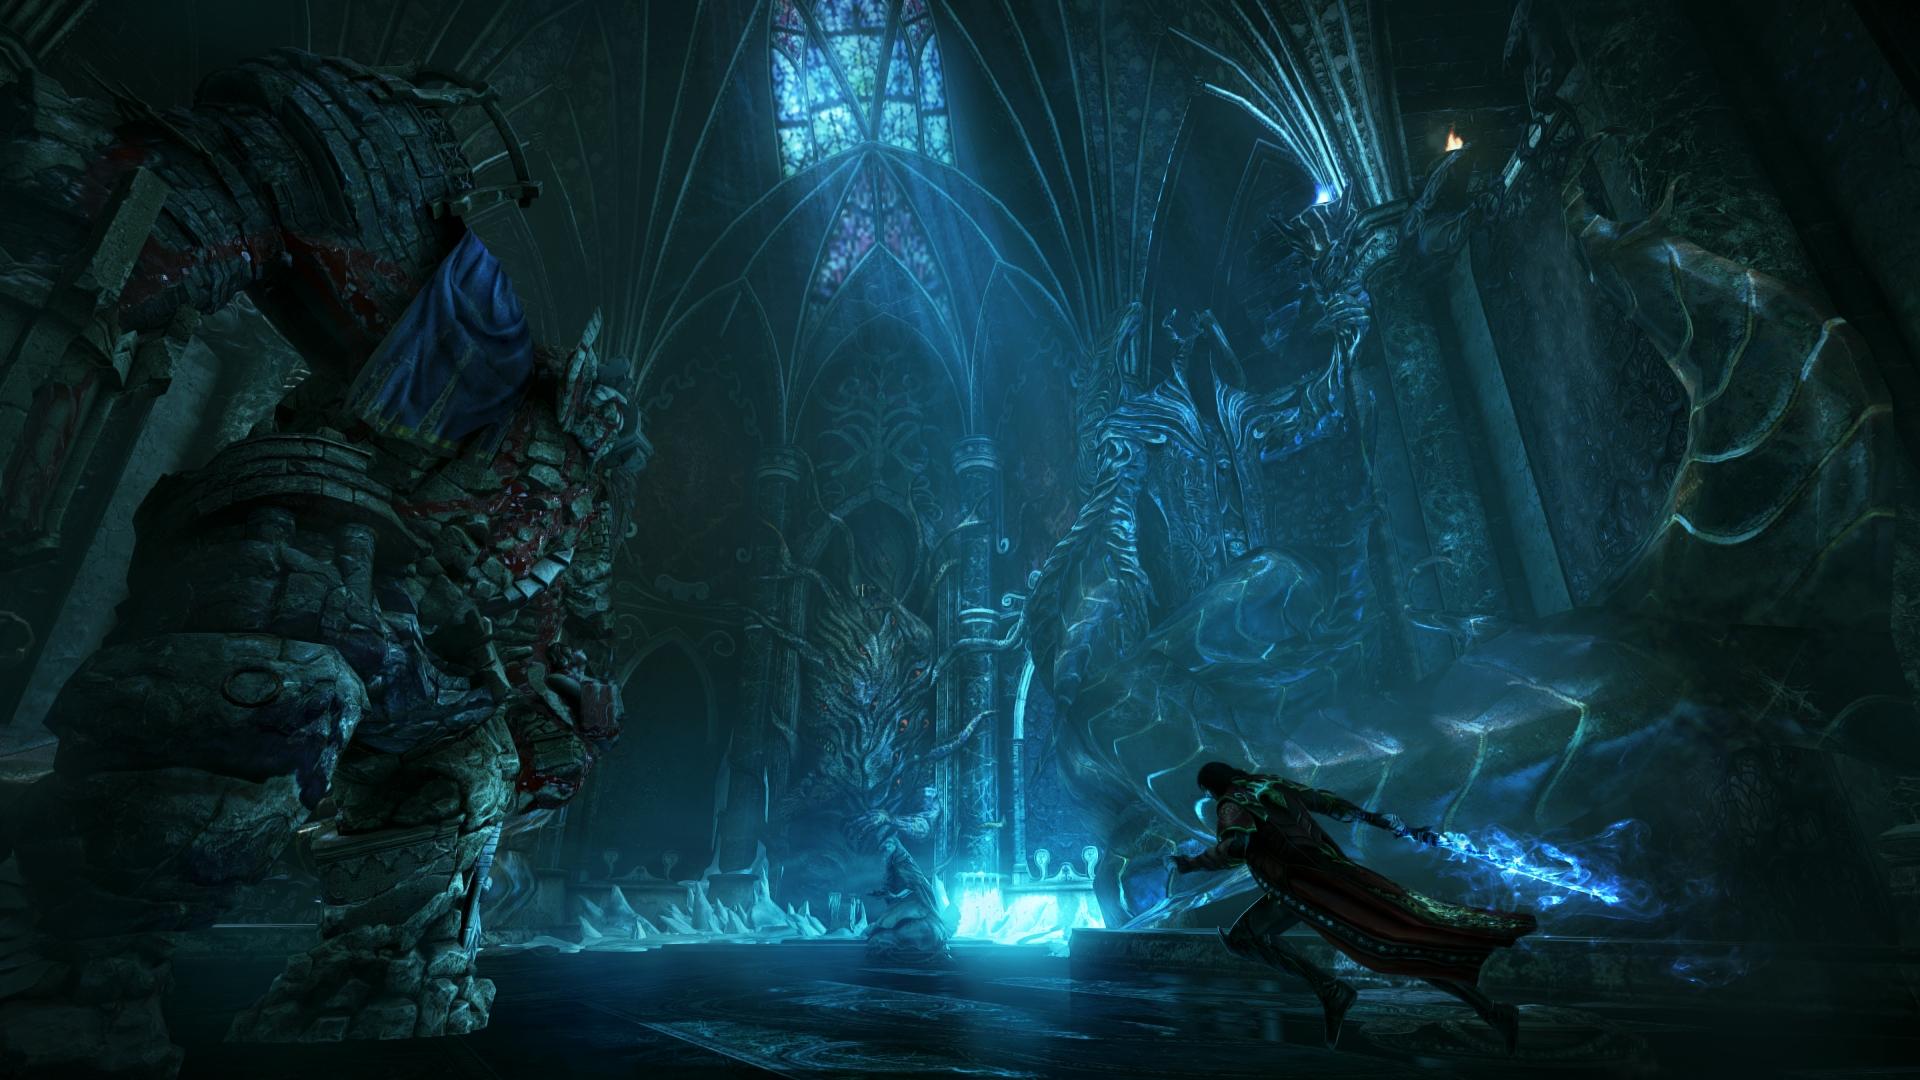 Screenshoty z Castlevania: Lords of Shadow 2 84888